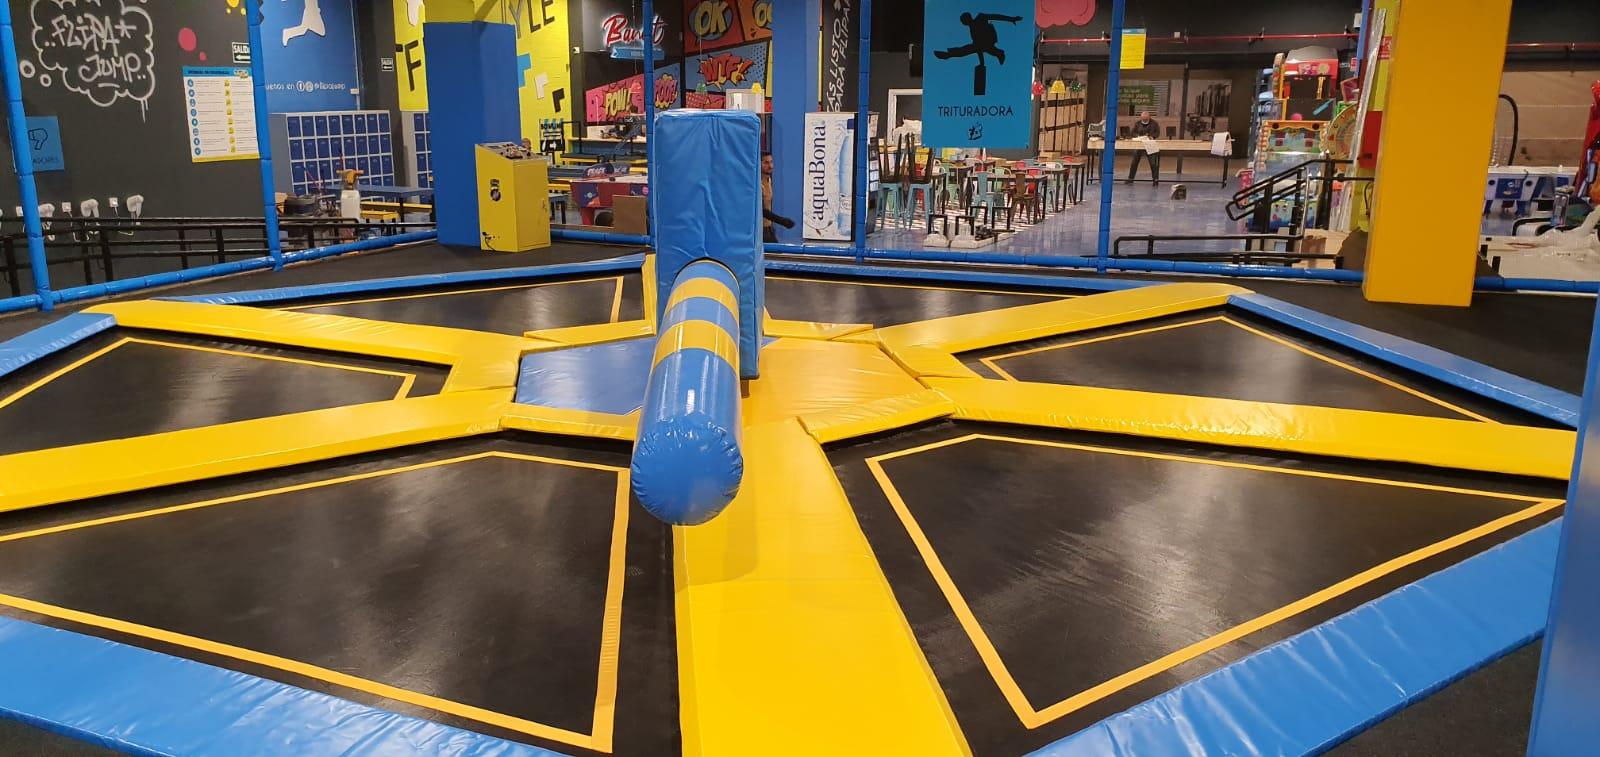 trampoline park españa